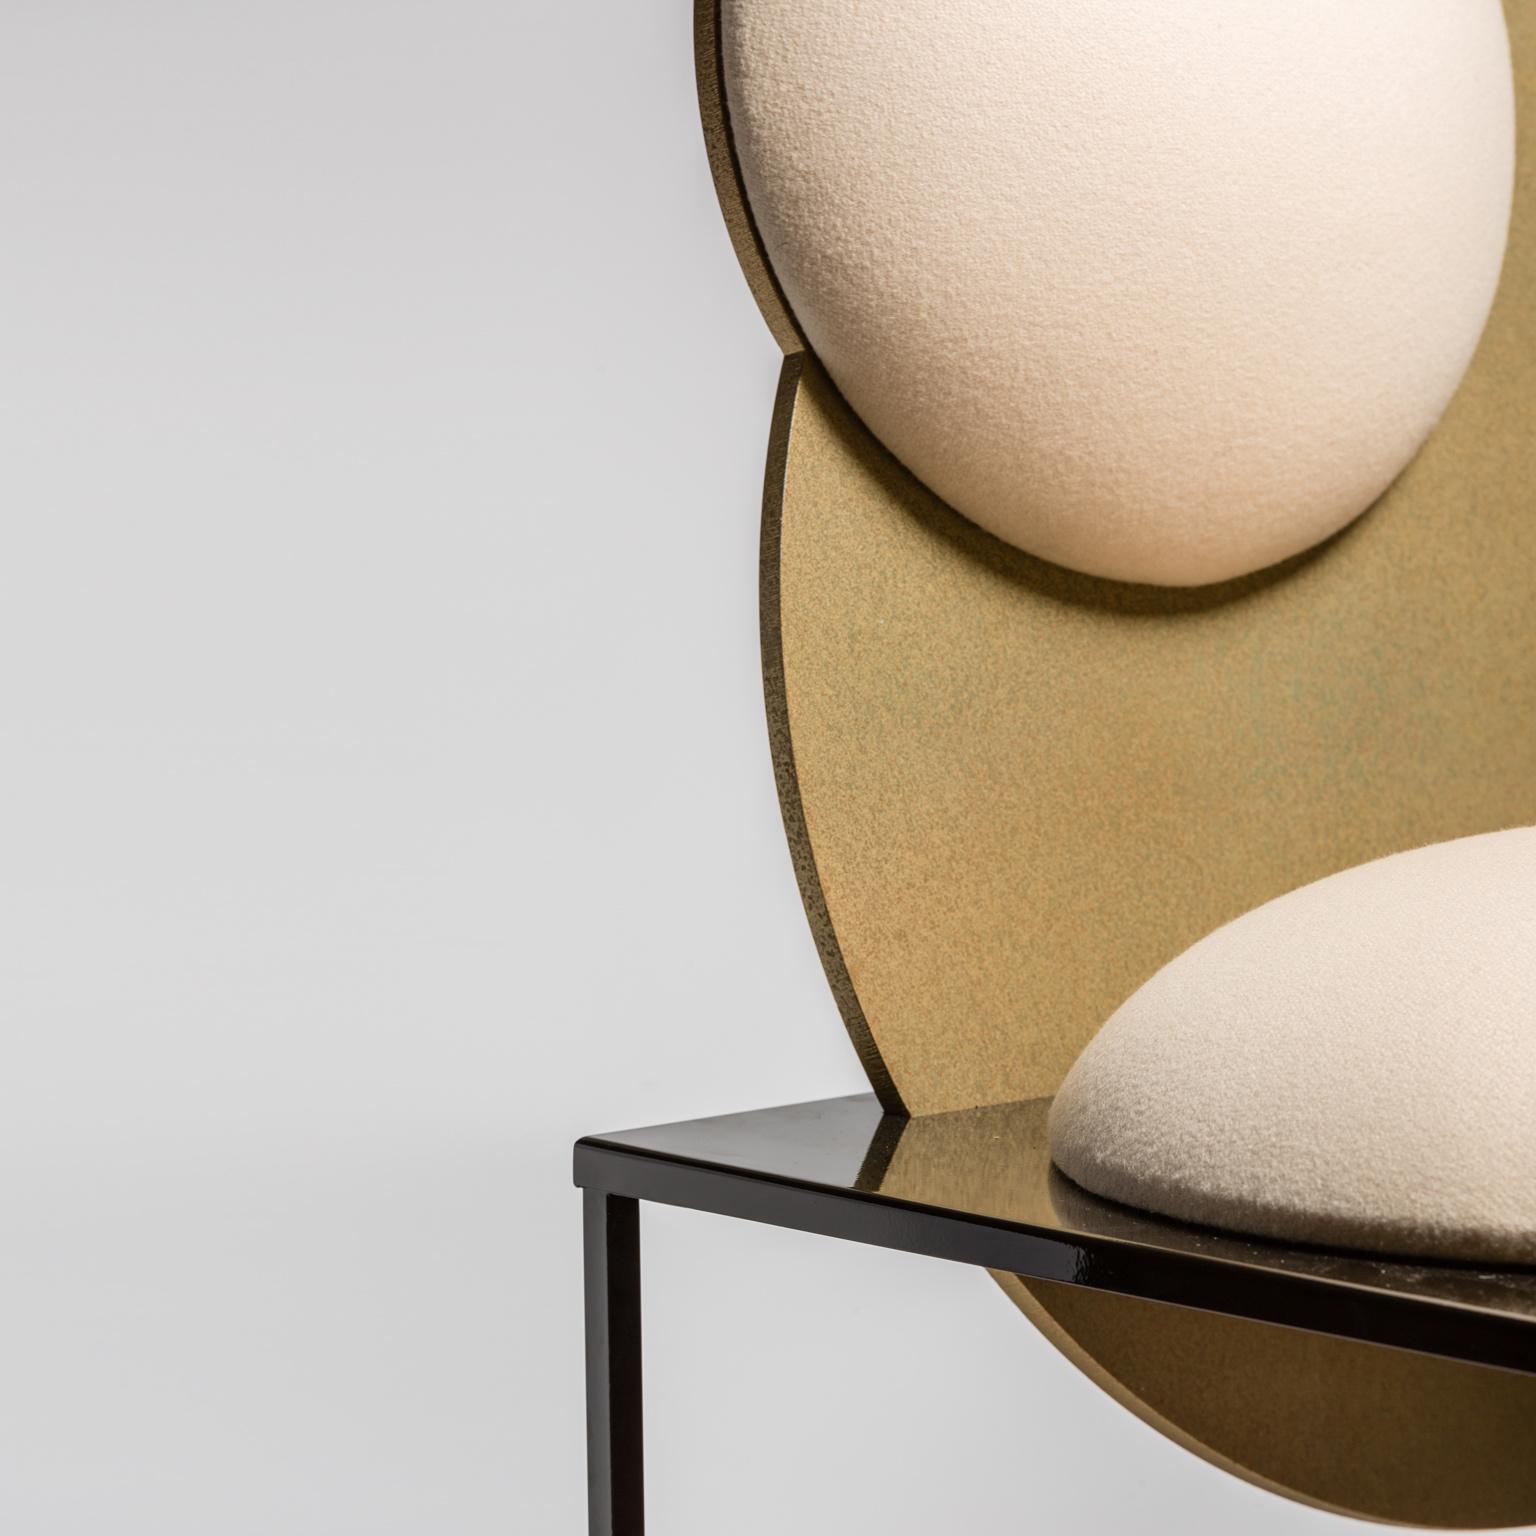 Bohinc Studio Celeste Chair Steel and Wool